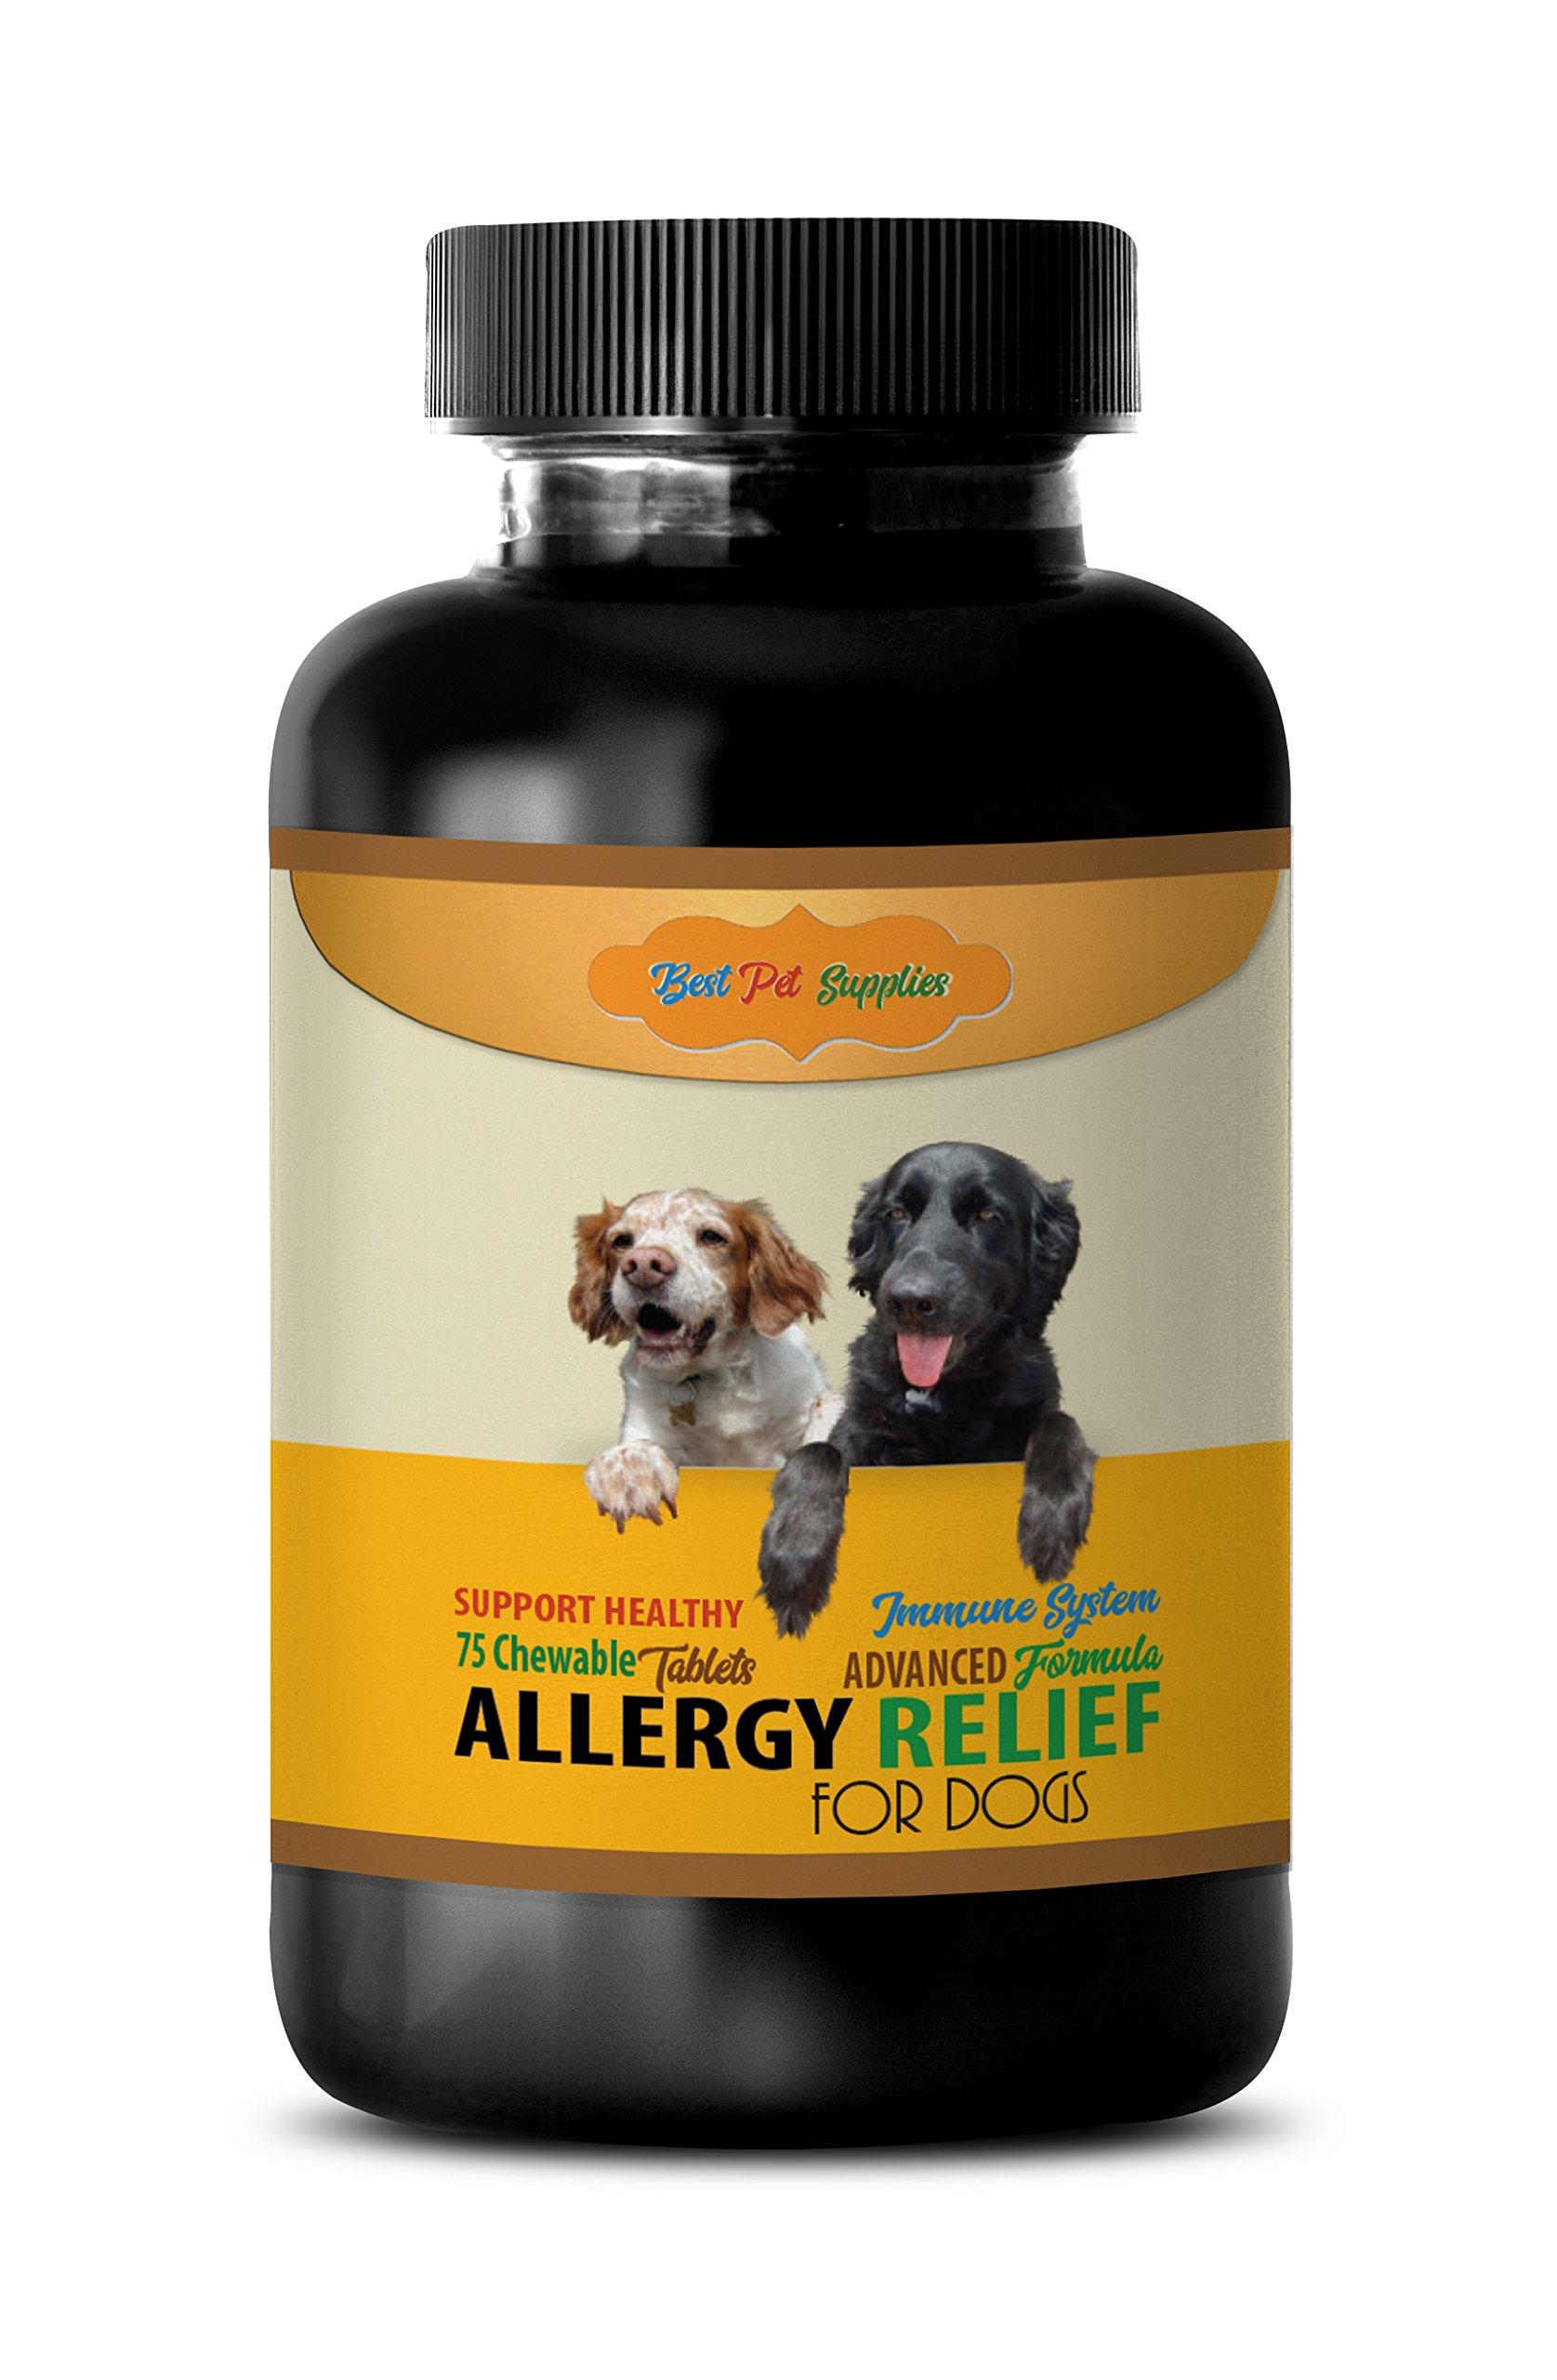 Dog Skin Allergy Supplement - Best Dog Allergy Relief - GET RID of ITCHING - Immune Support - Chews - Dog Supplements tumeric - 75 Treats (1 Bottle) by BEST PET SUPPLIES LLC